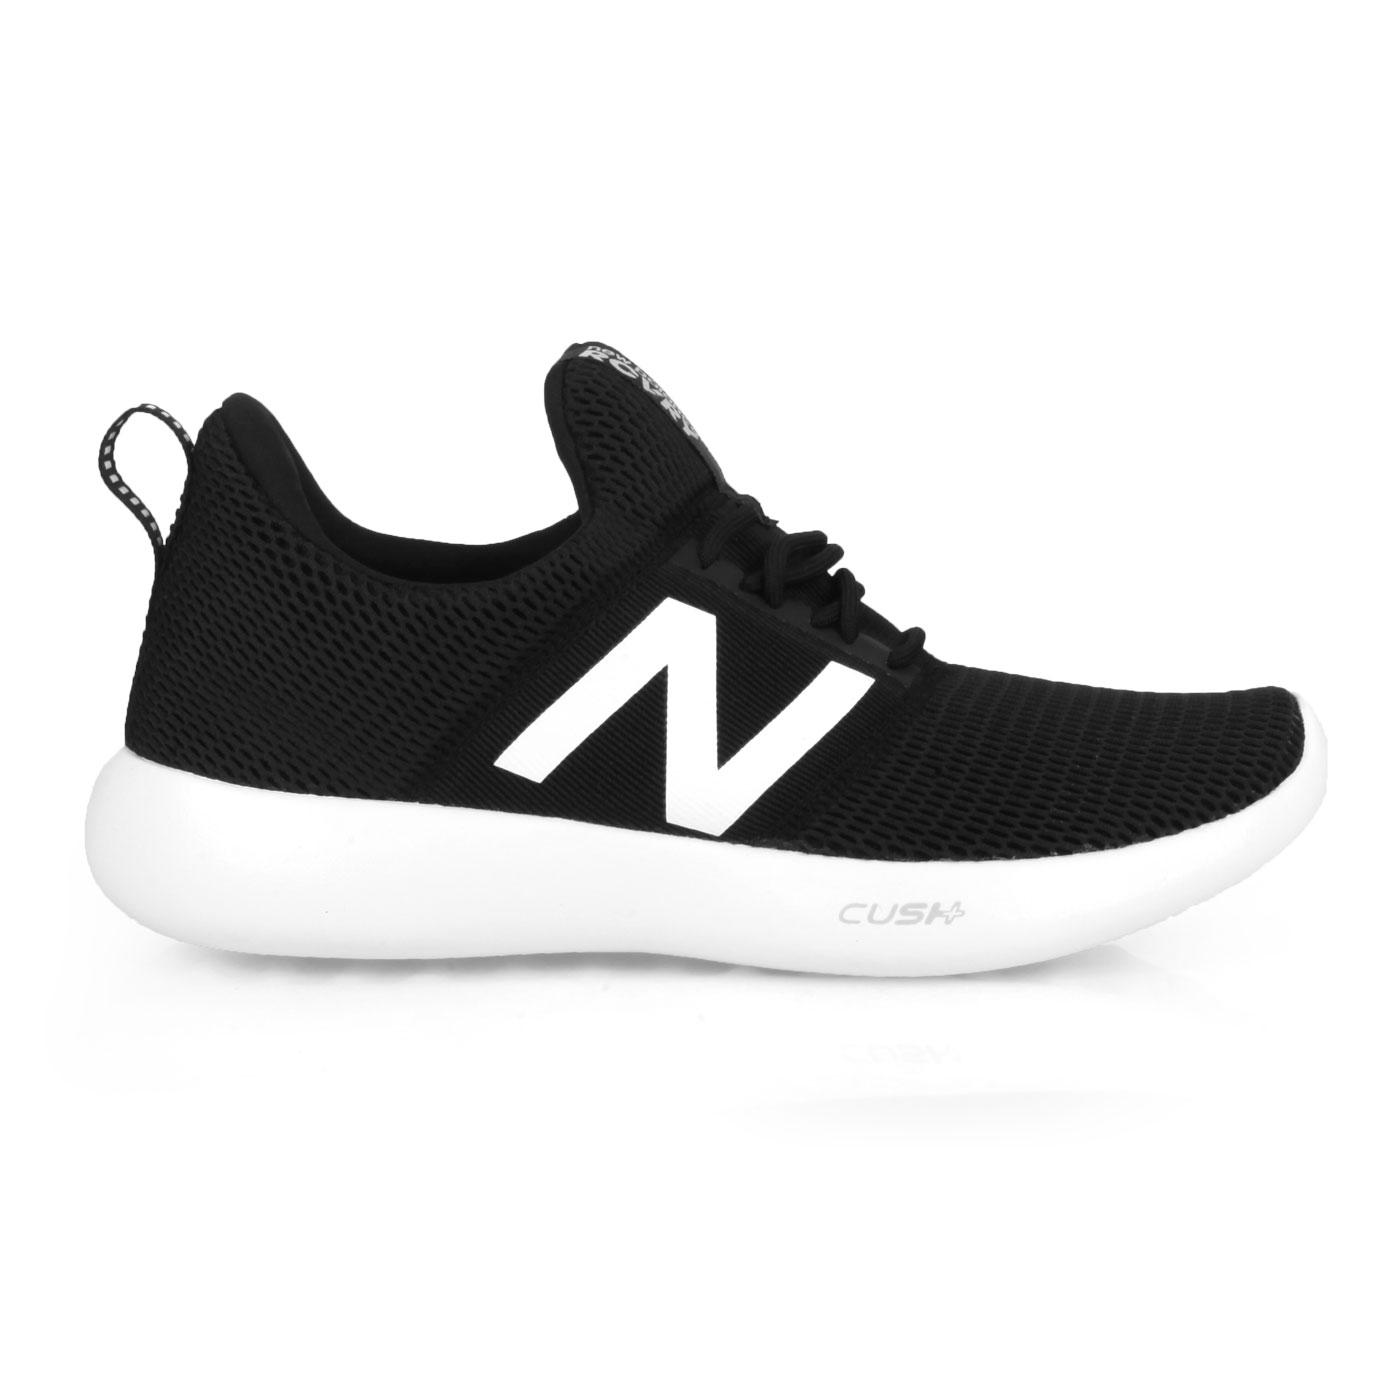 NEW BALANCE 男款休閒運動鞋-2E RCVRYB2 - 黑白